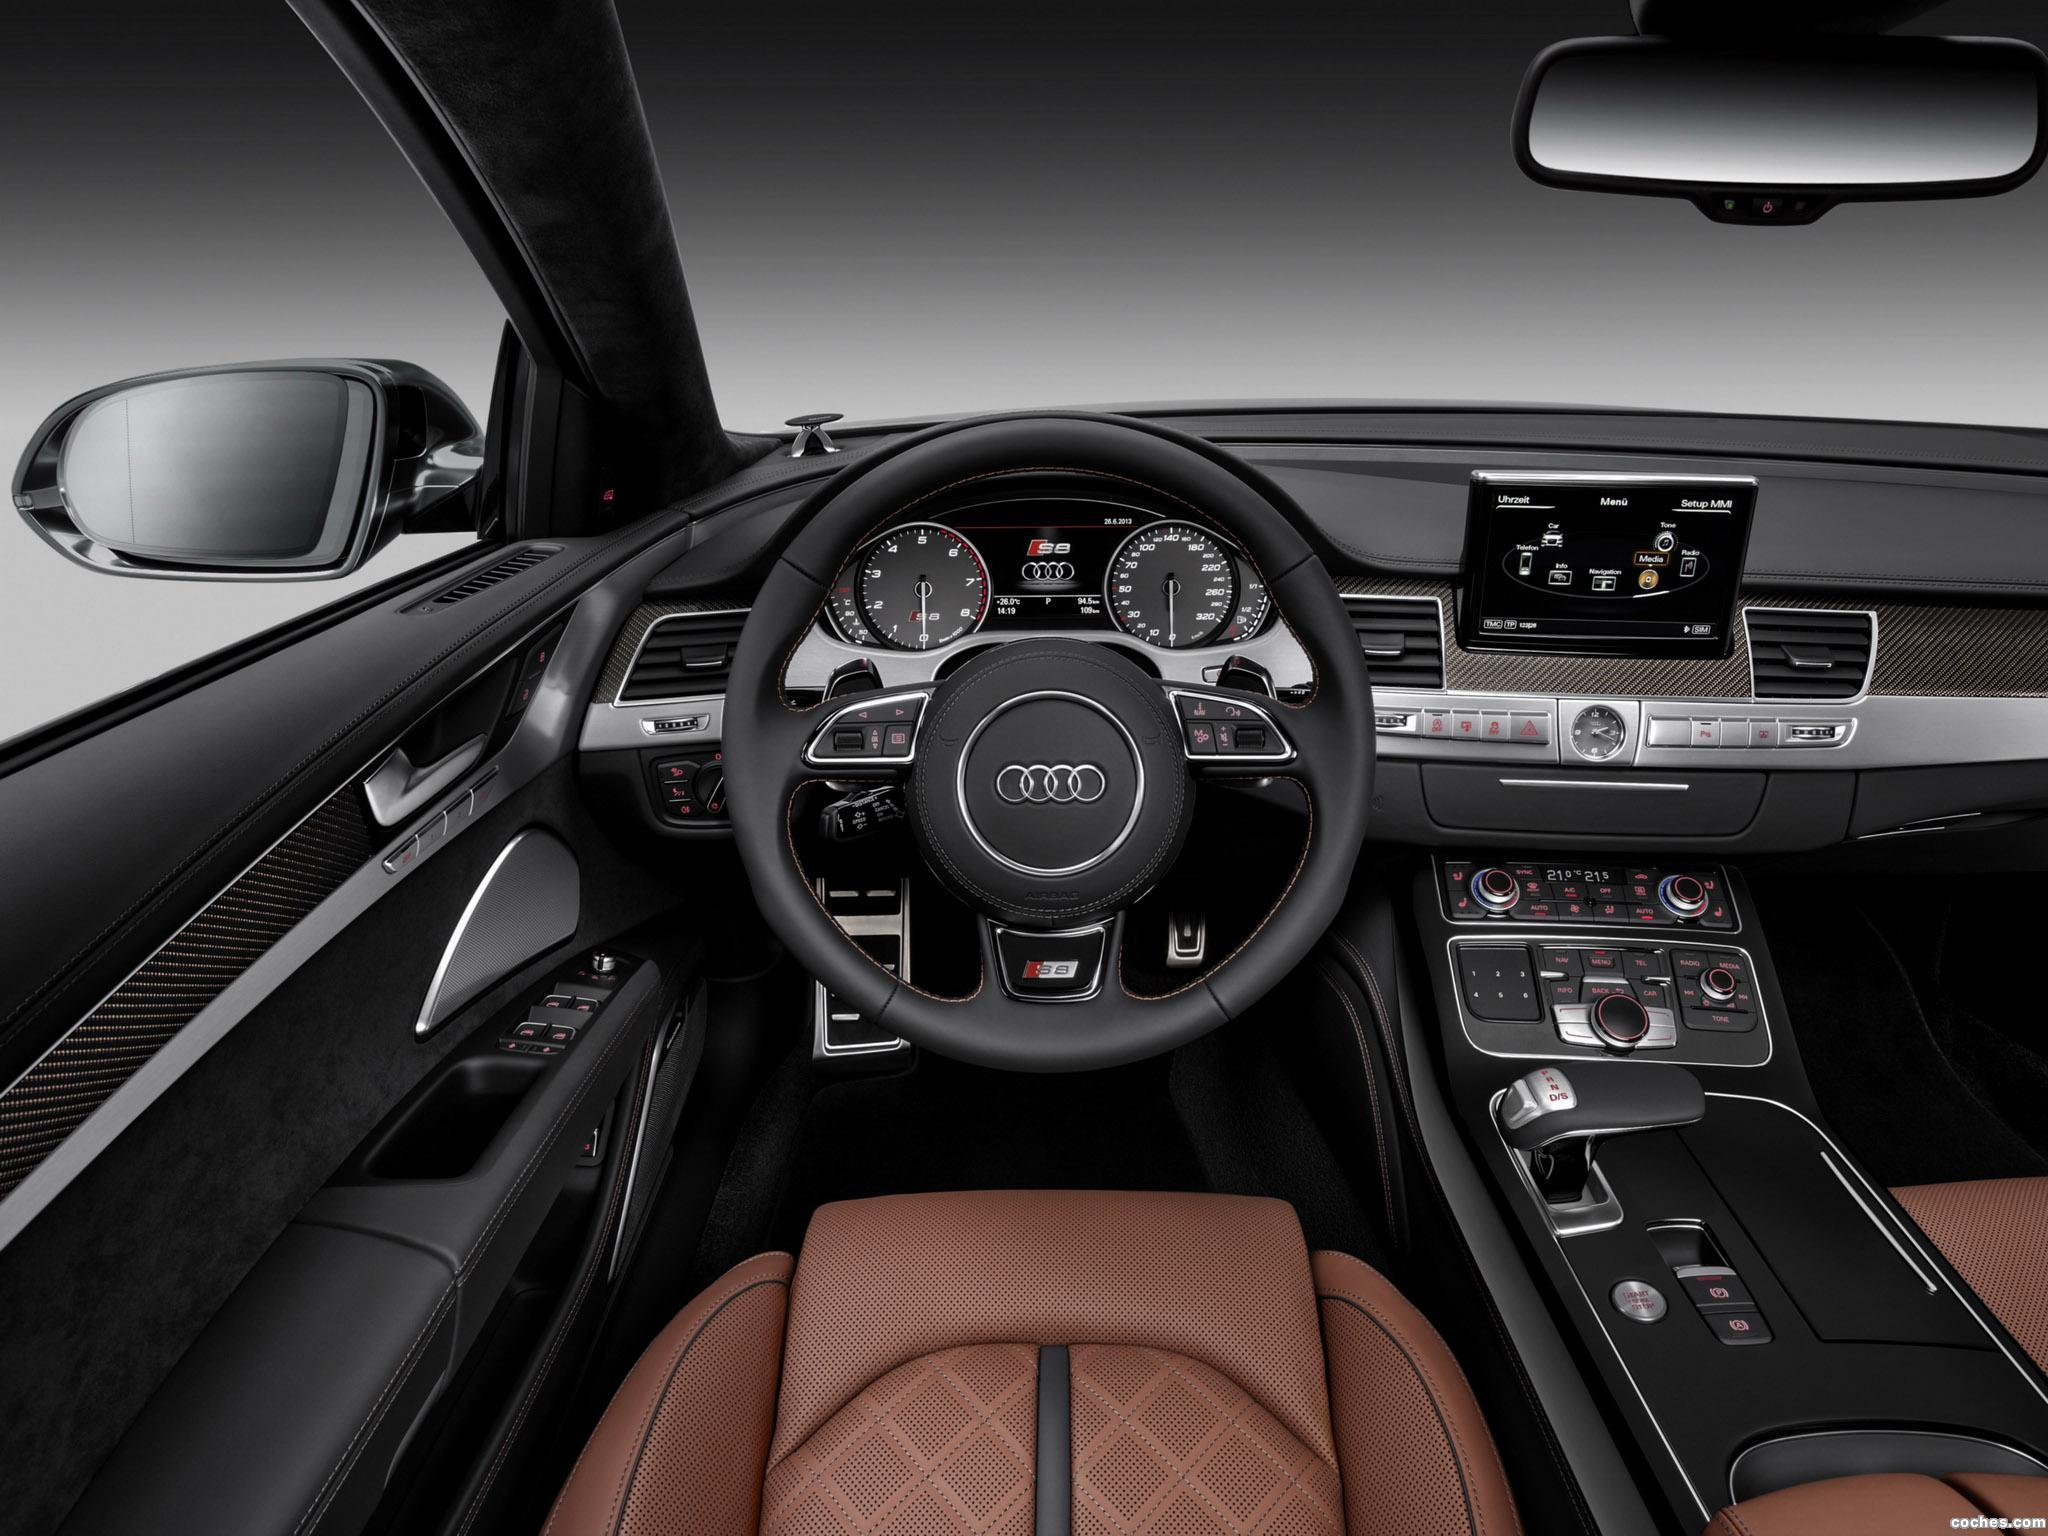 Foto 11 de Audi S8 D4 2013